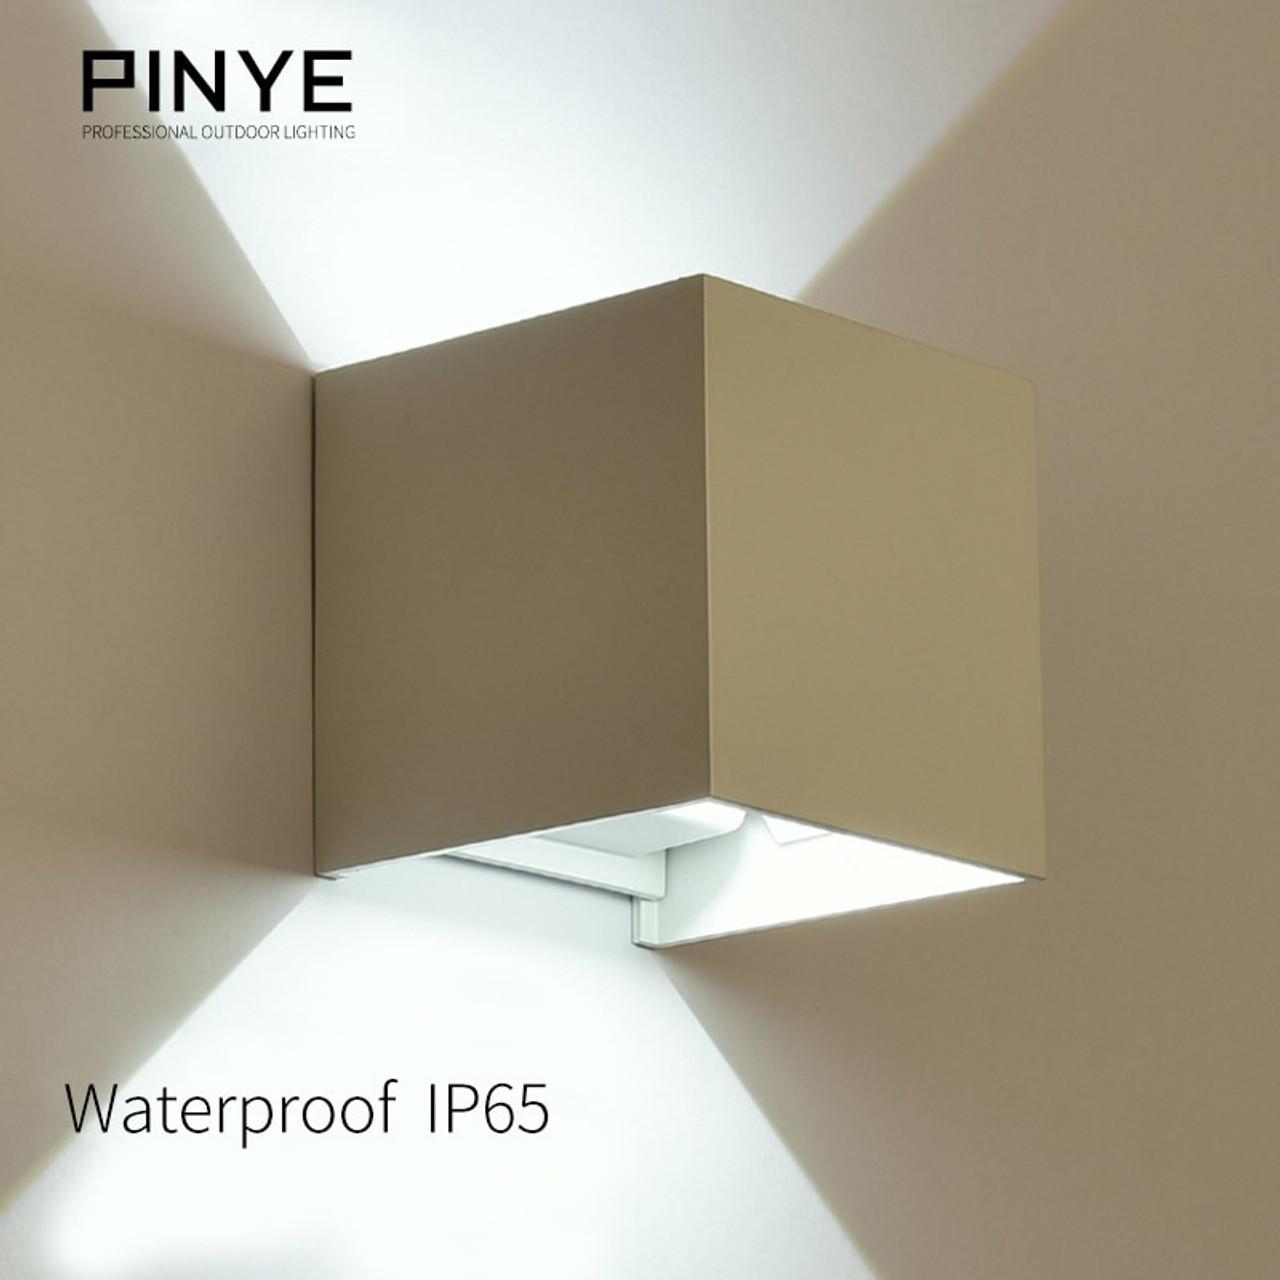 6w led wall light outdoor ip65 waterproof modern lighting nordic style indoor wall lamps living room porch garden light